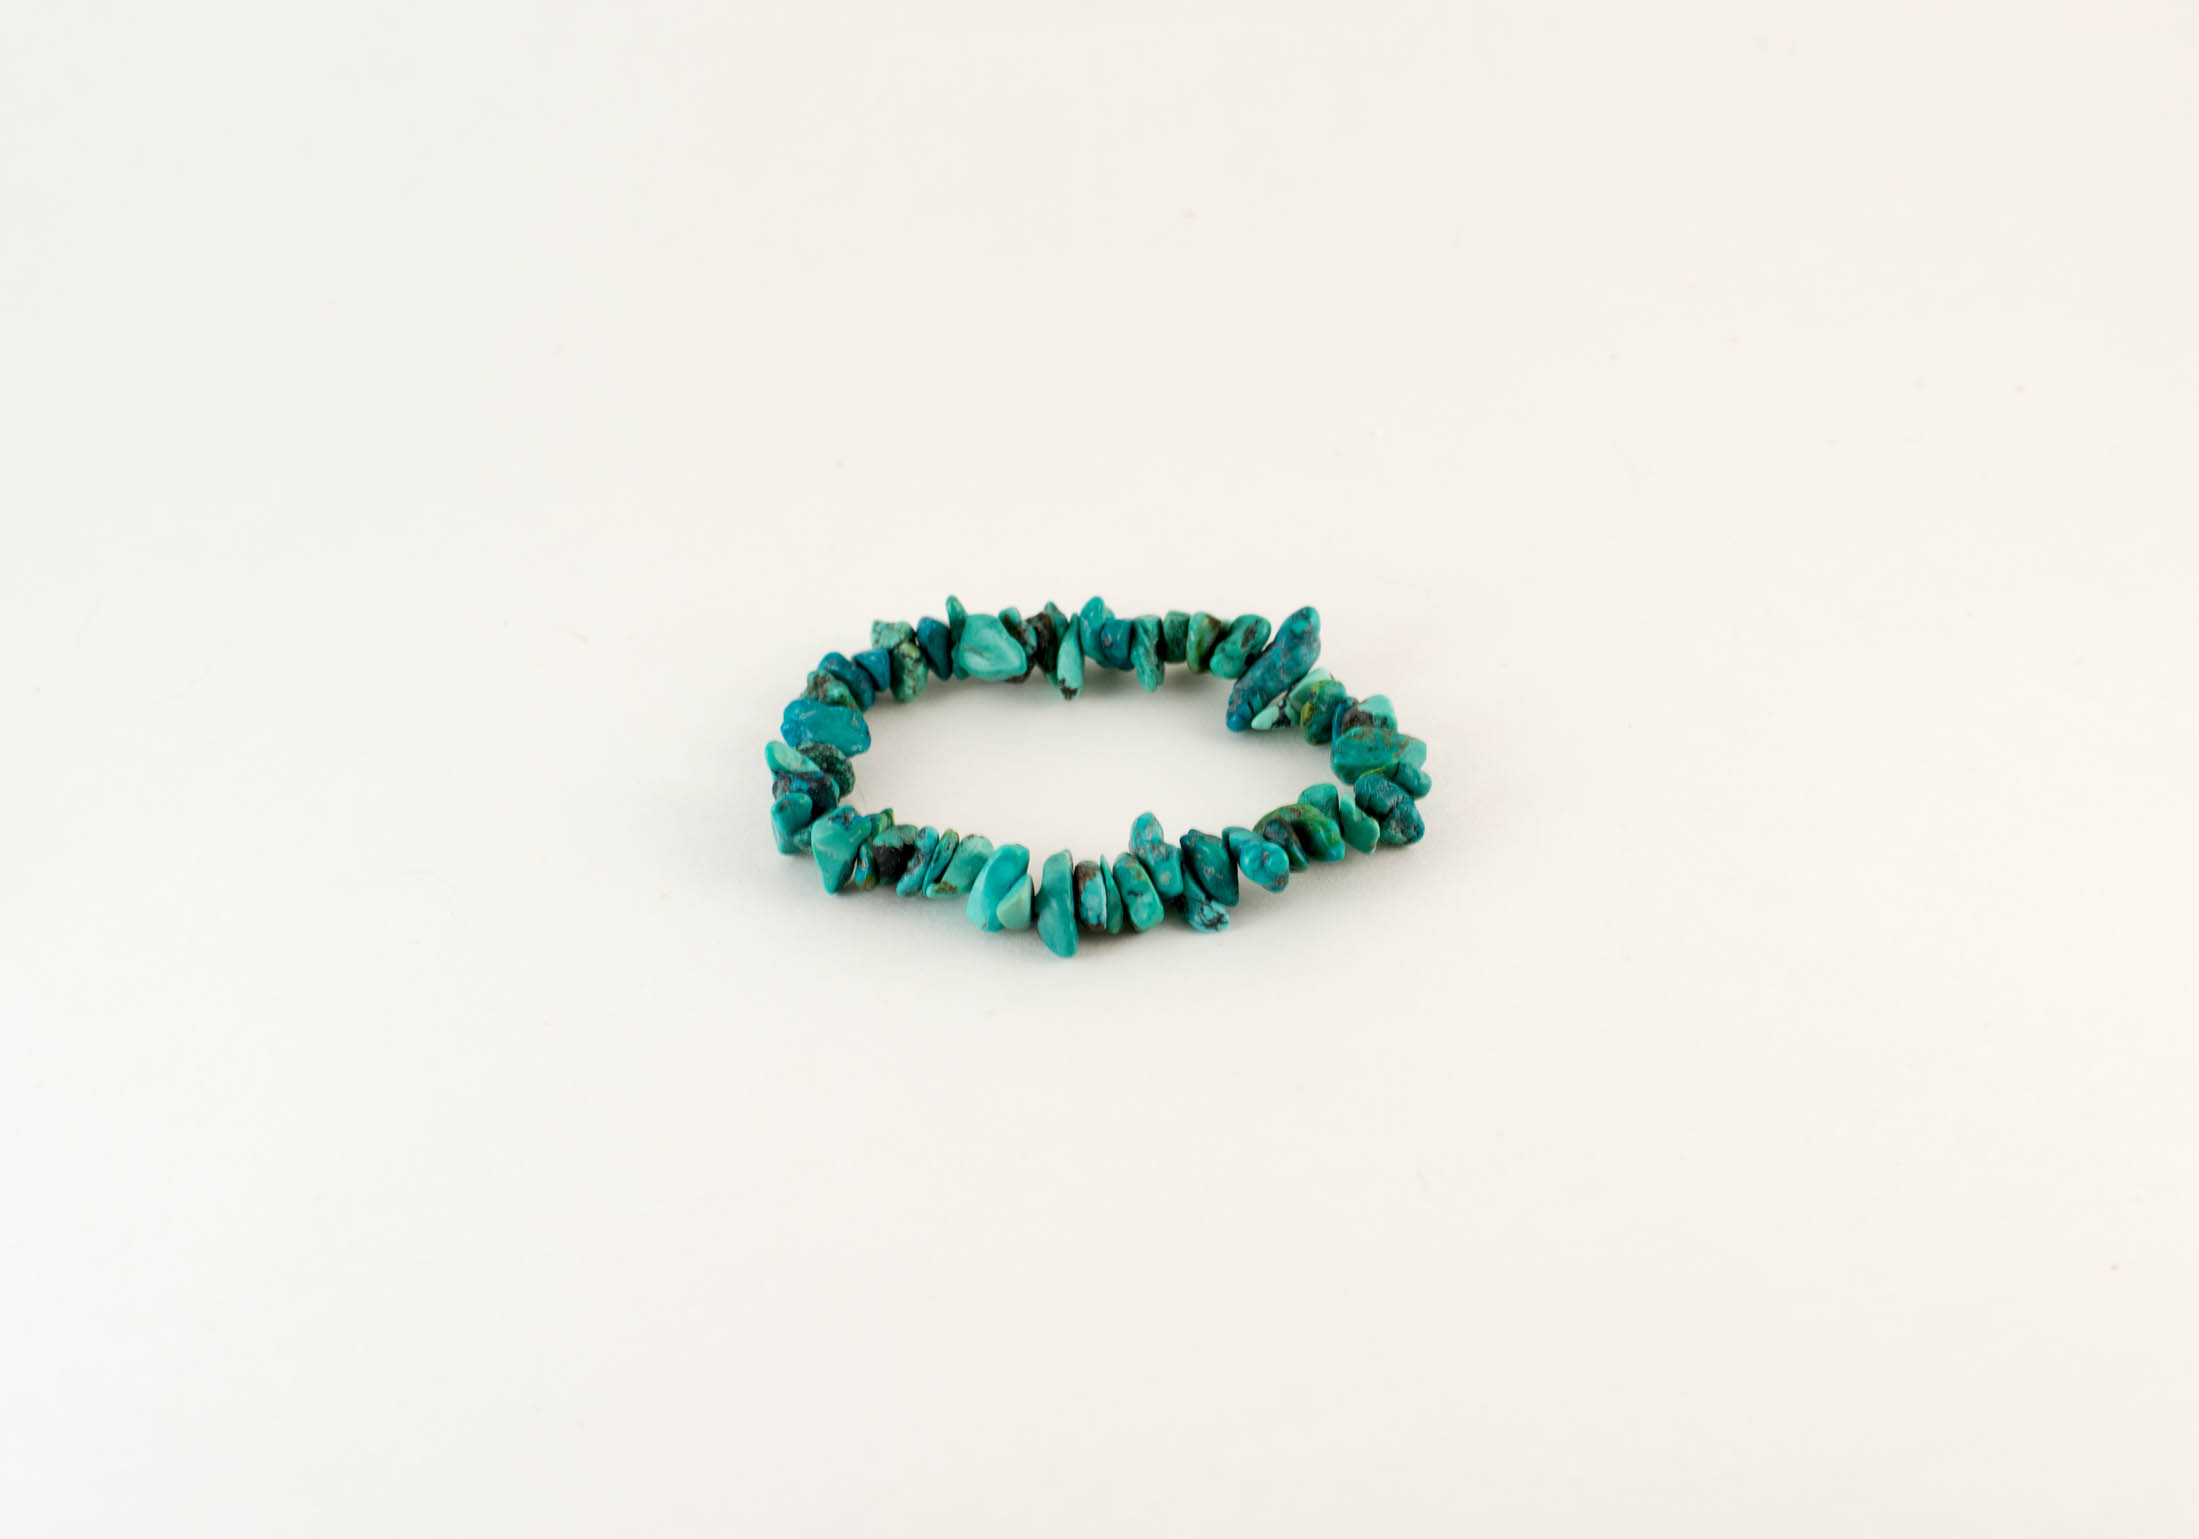 diy turquoise bracelet